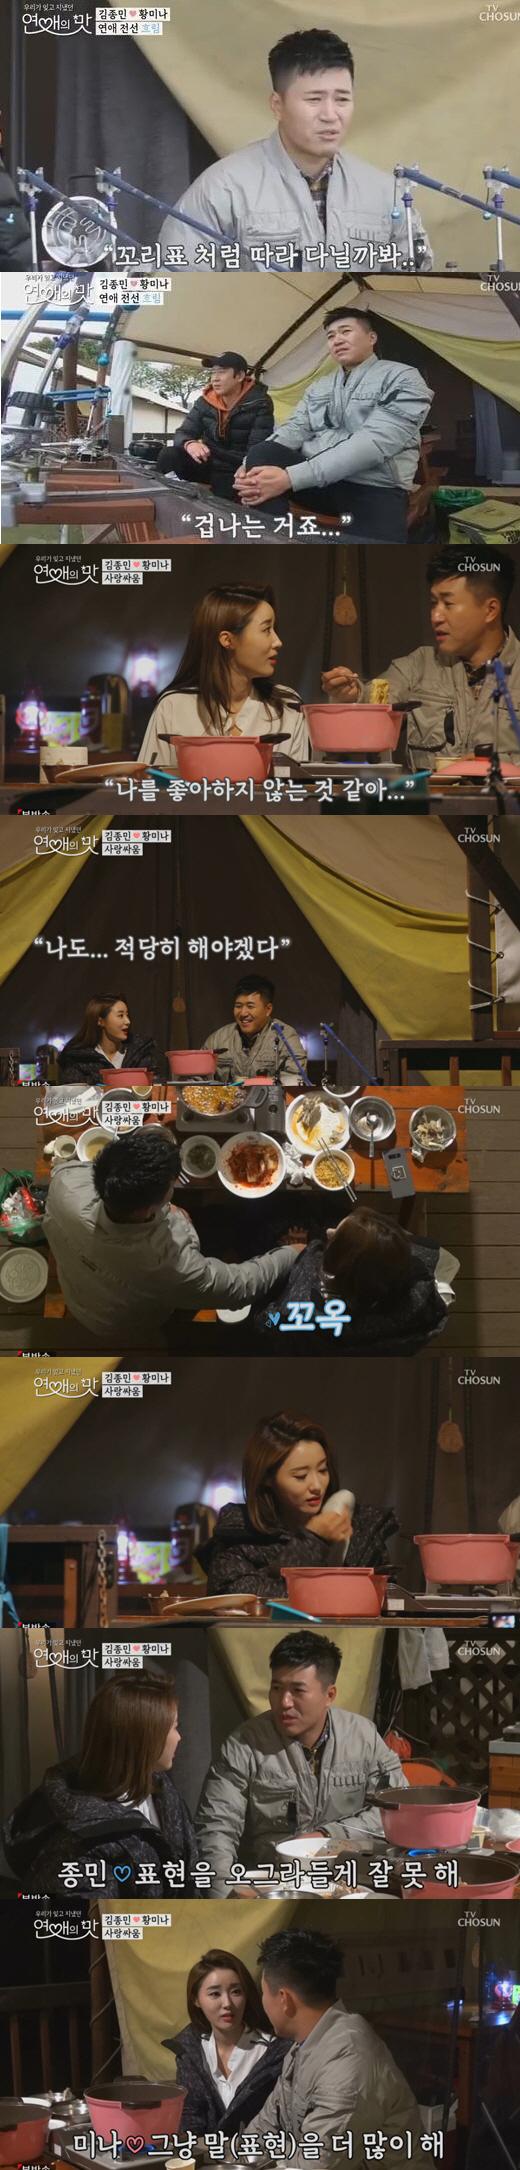 [SC리뷰]'연애의 맛' 황미나, 표현 서툰 ♥김종민에 끝내 '눈물'…이대로 연애 종료되나